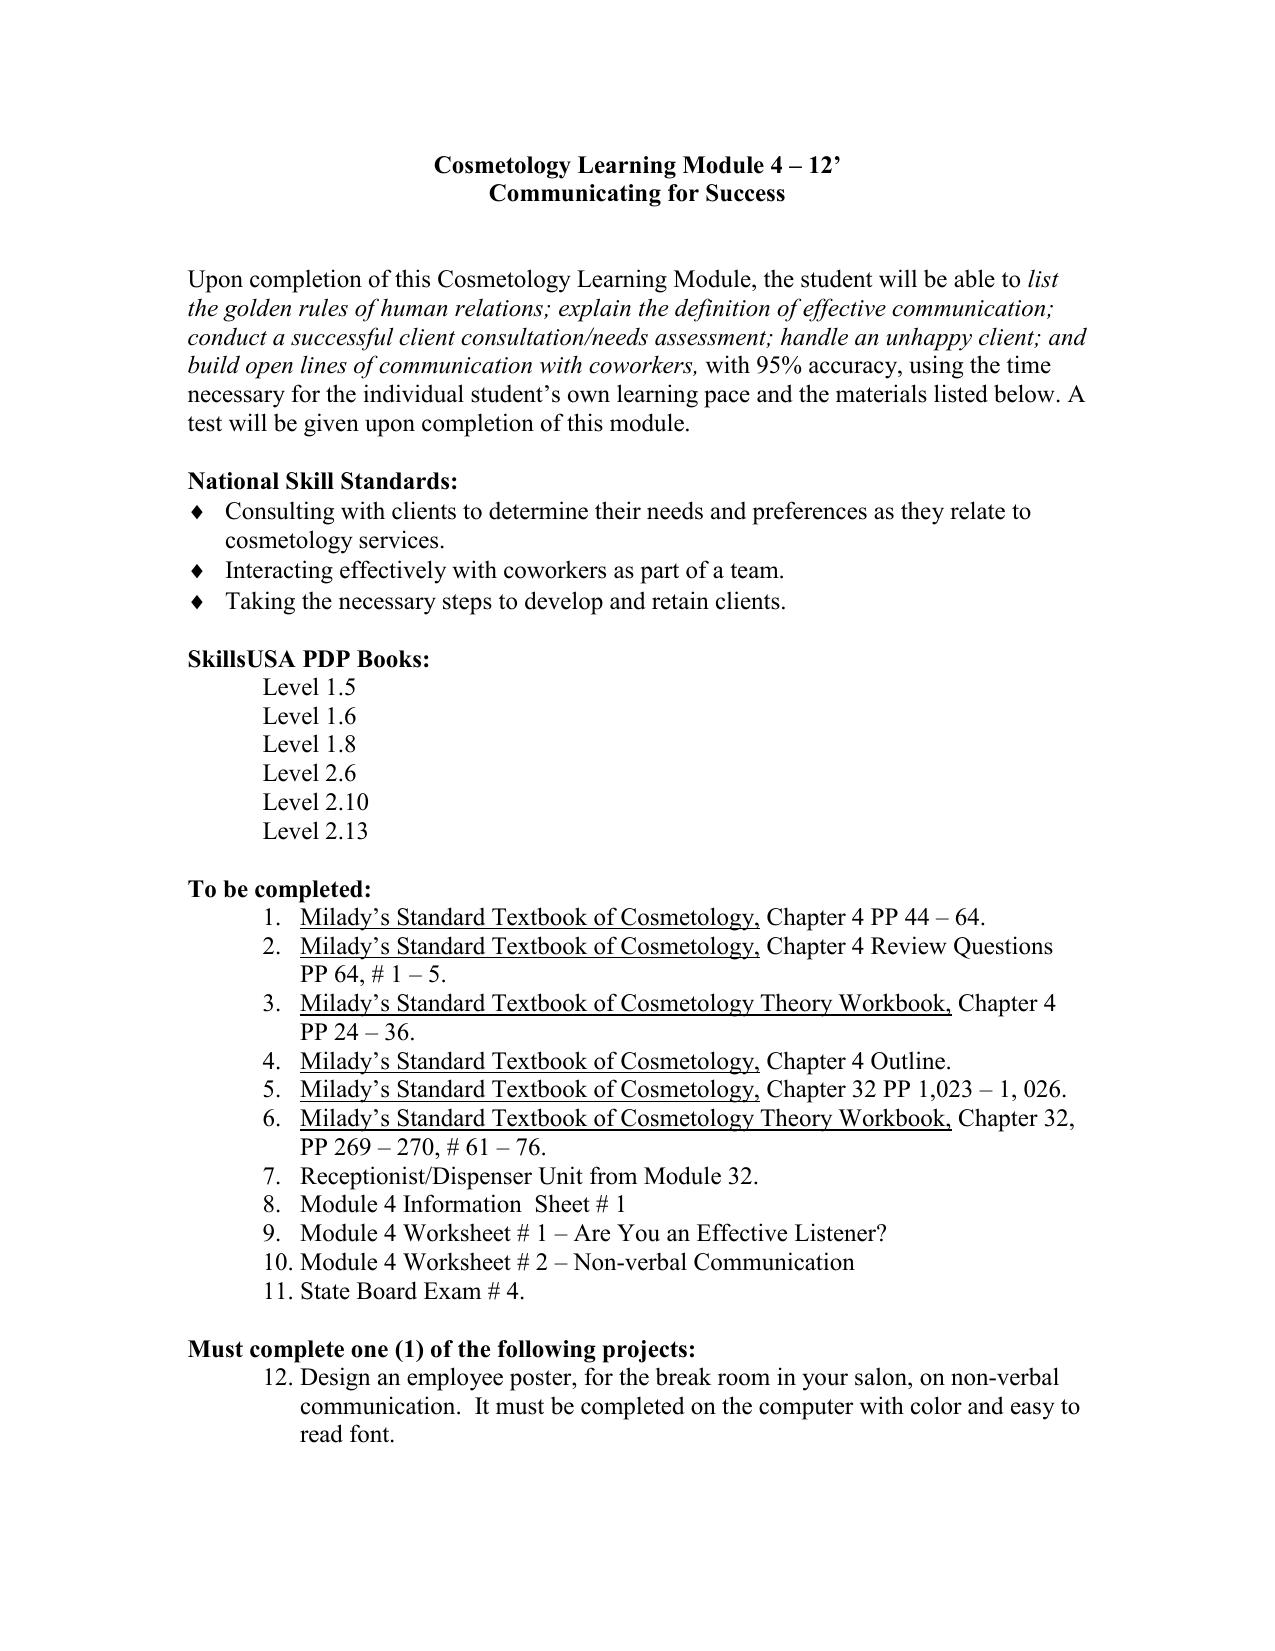 cosmetology learning module 4